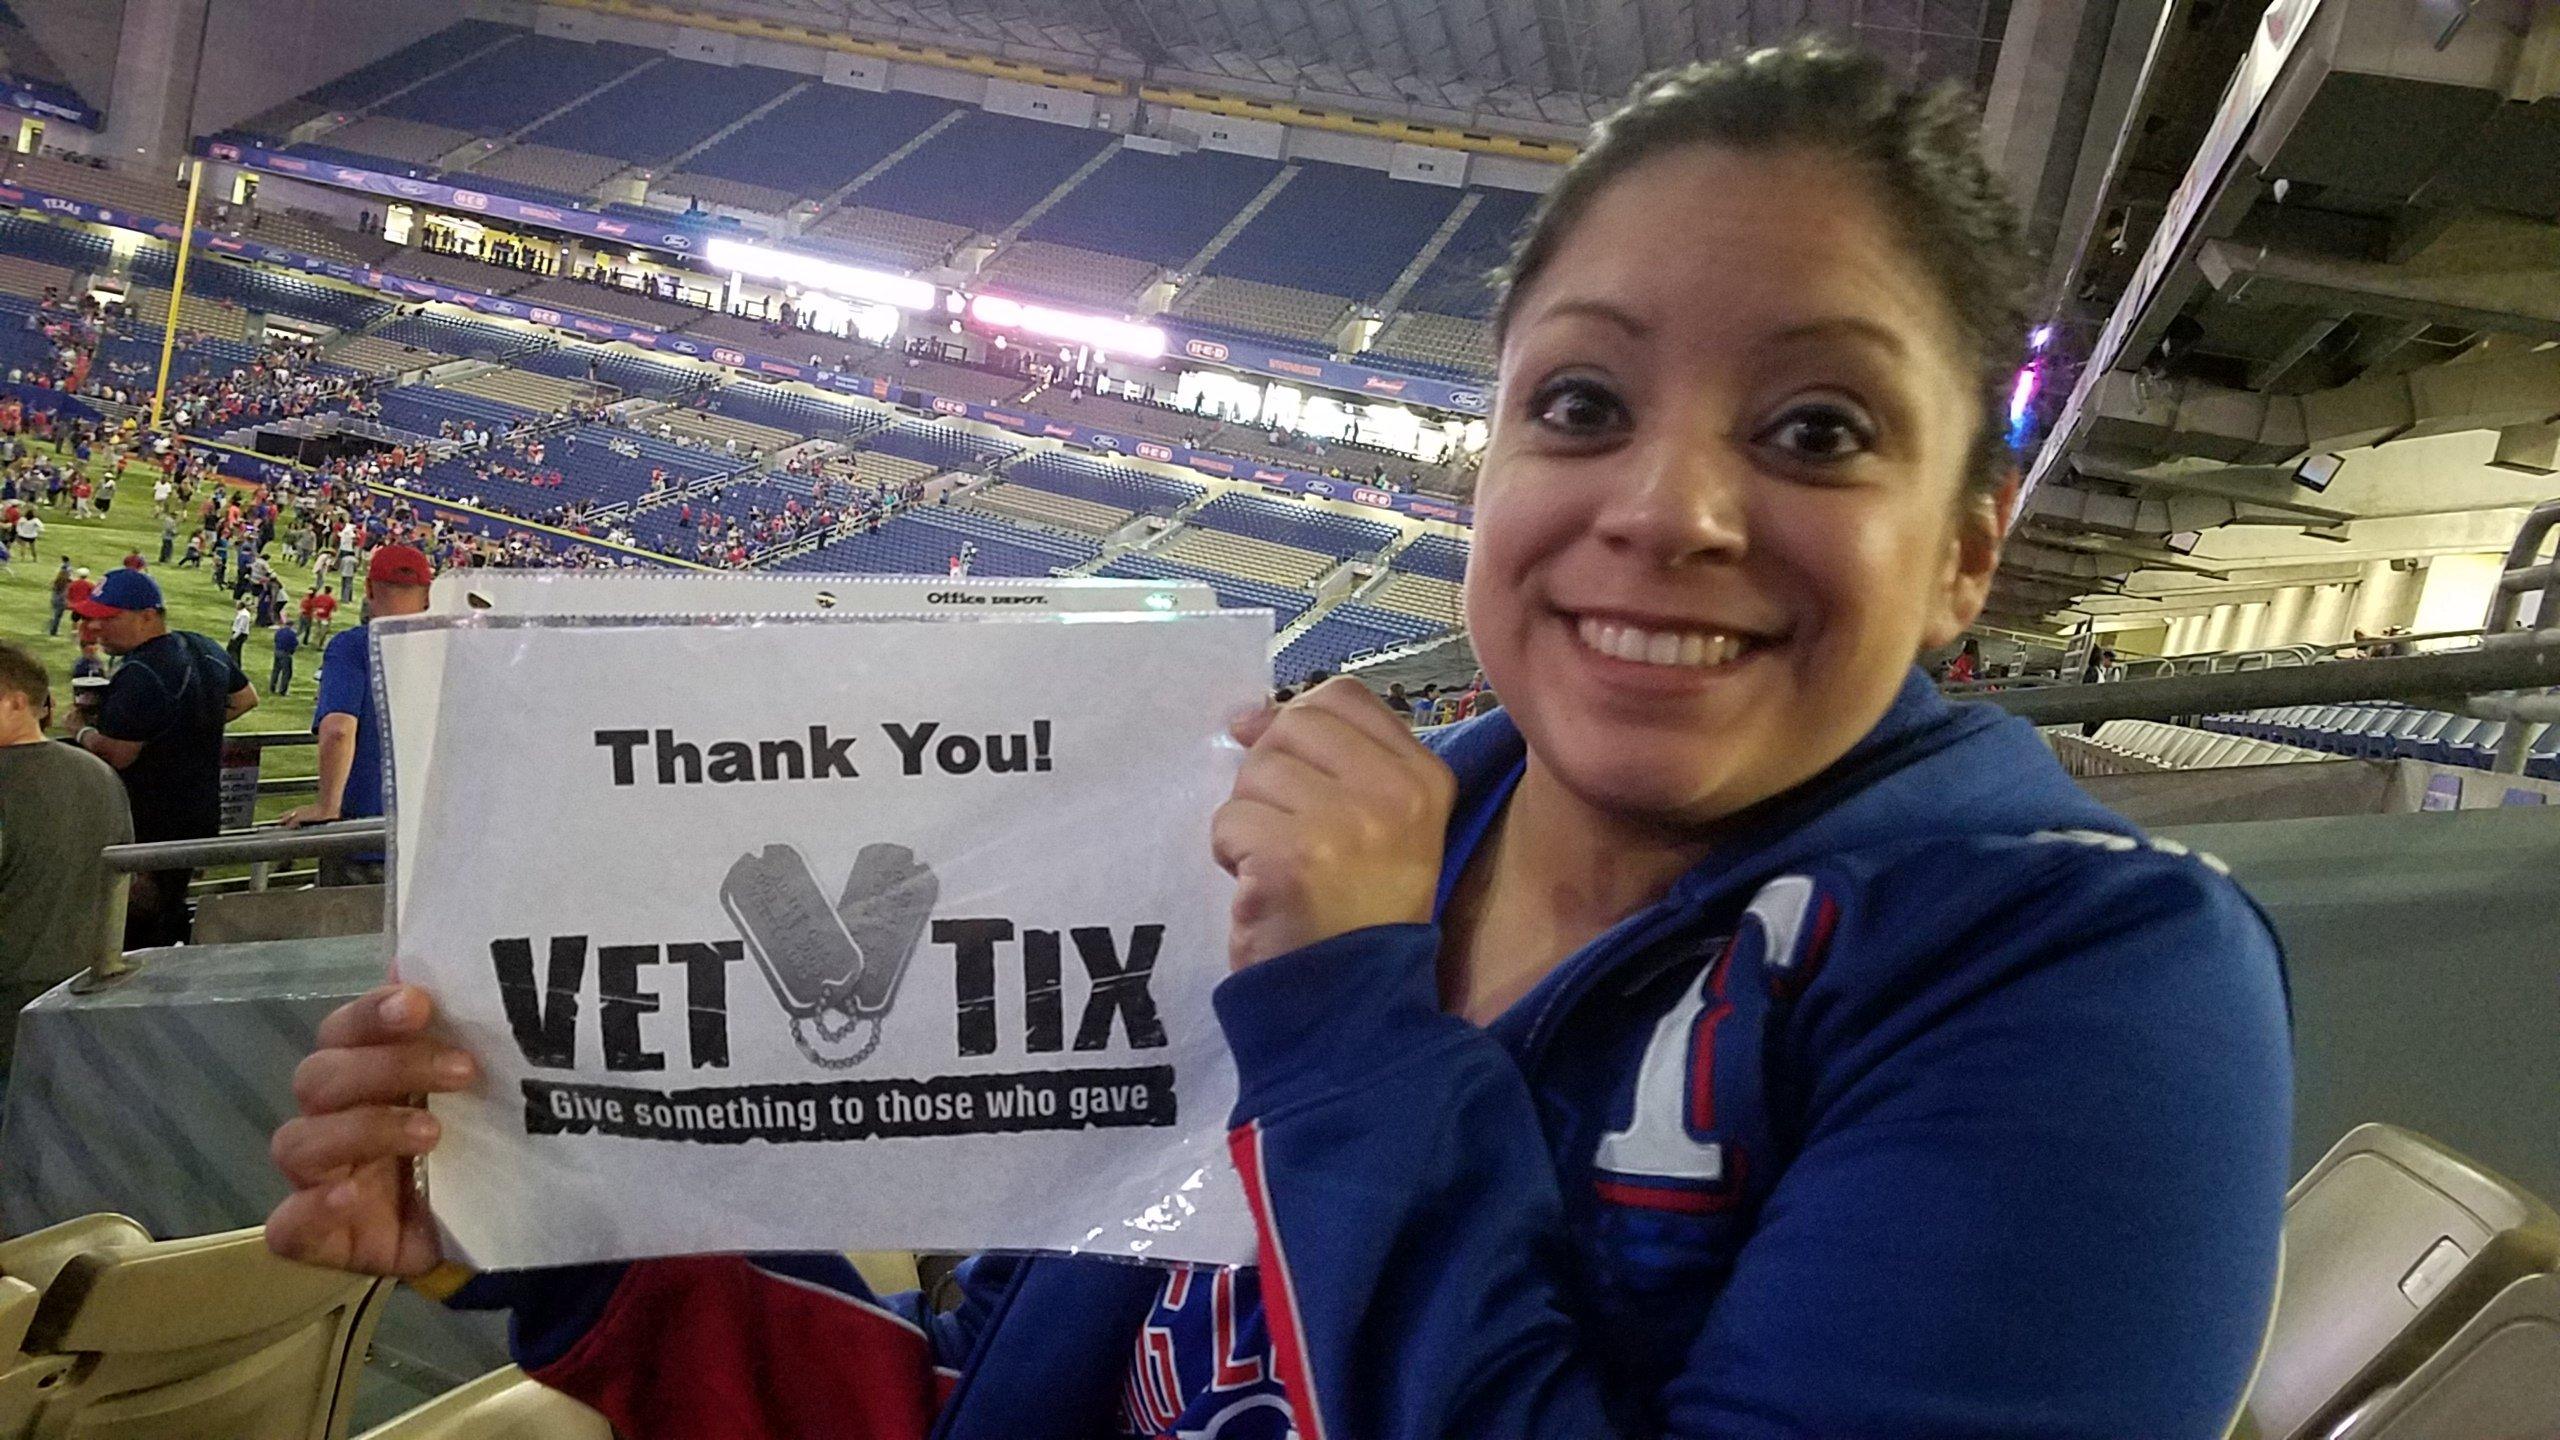 VetTixer Thank You Messages